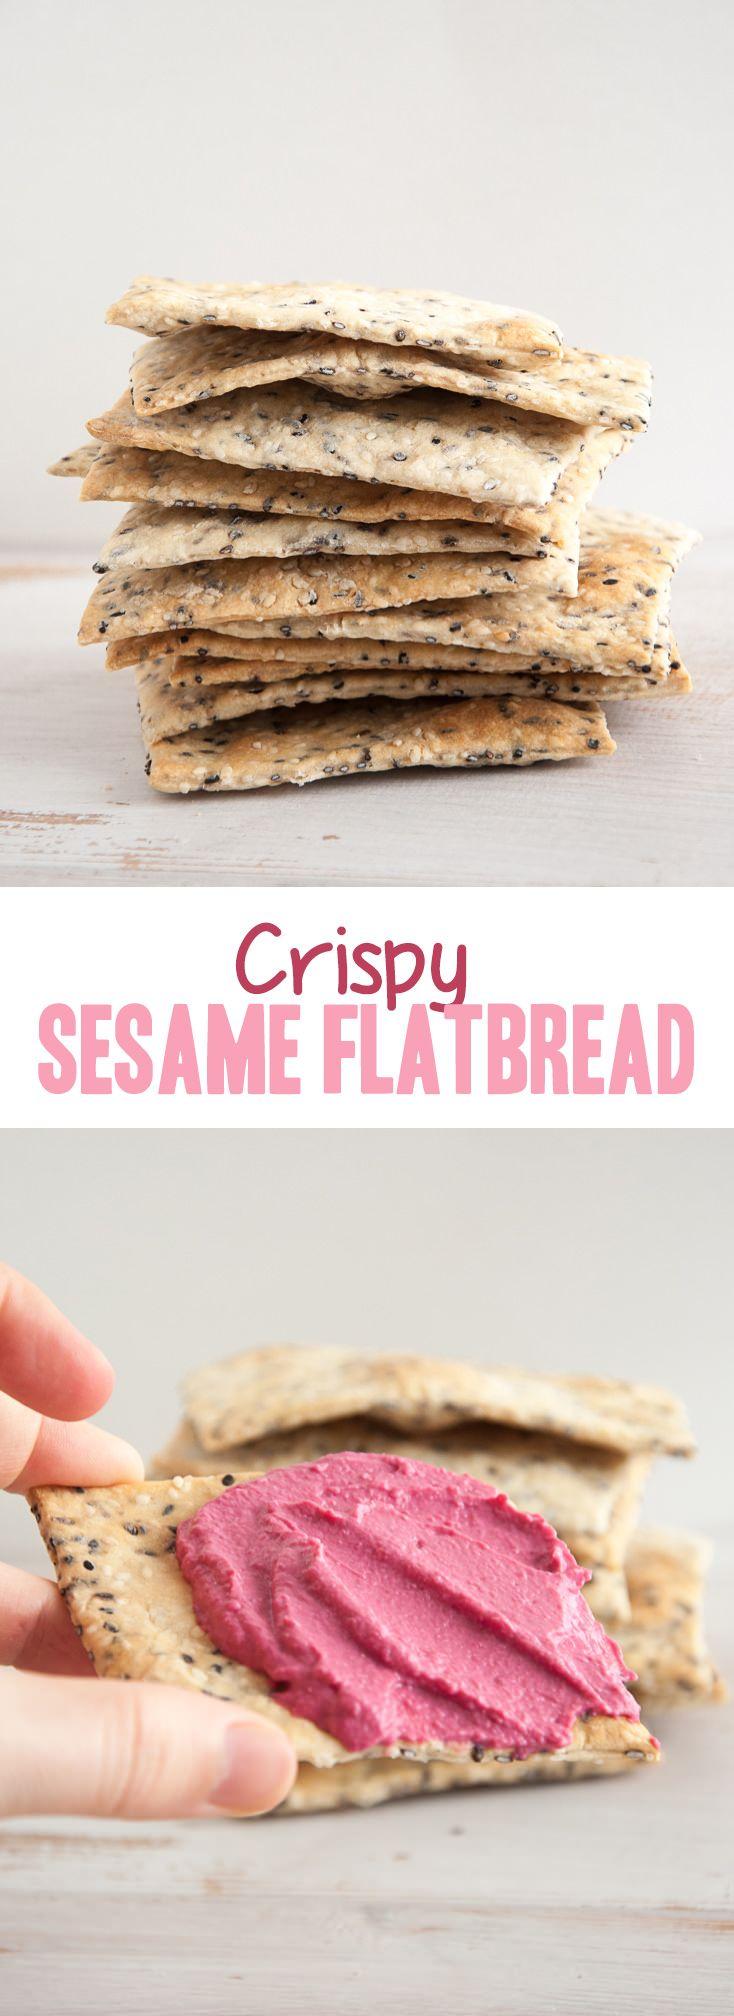 Crispy Sesame Flatbread #vegan #bread  ElephantasticVegan.com